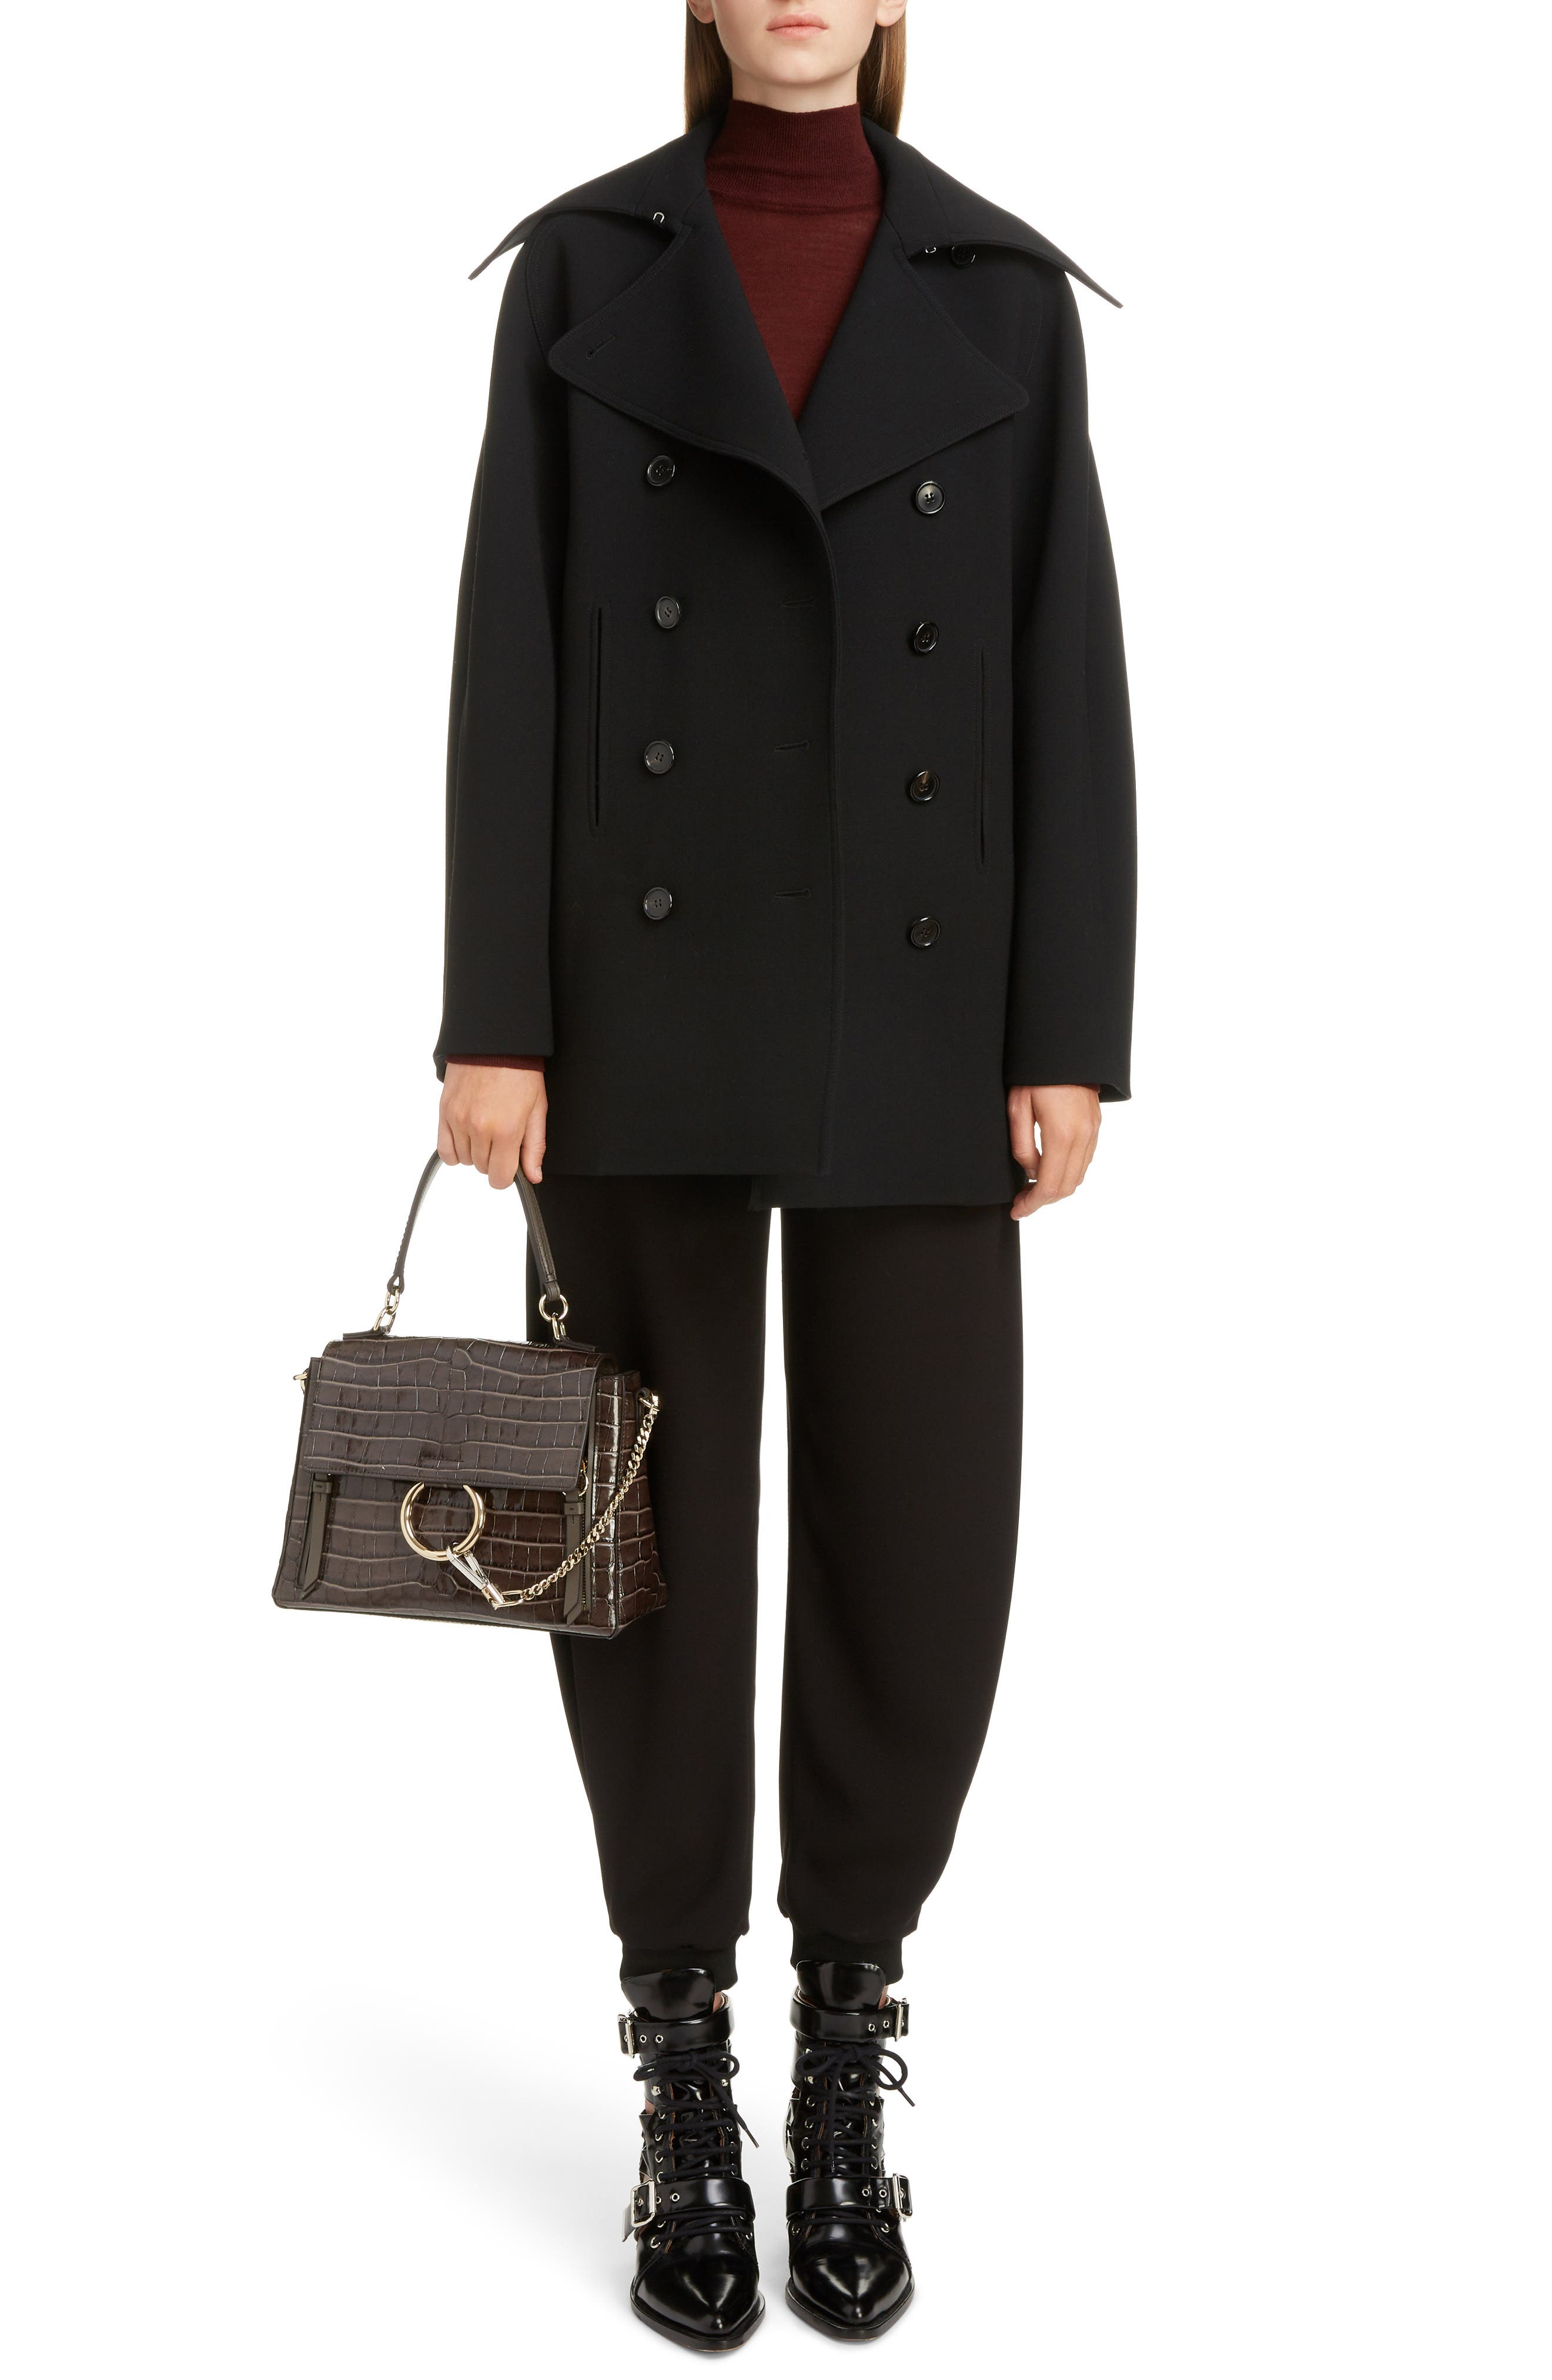 Medium Faye Day Croc Embossed Leather Shoulder Bag,                             Alternate thumbnail 2, color,                             AUTUMNAL BROWN